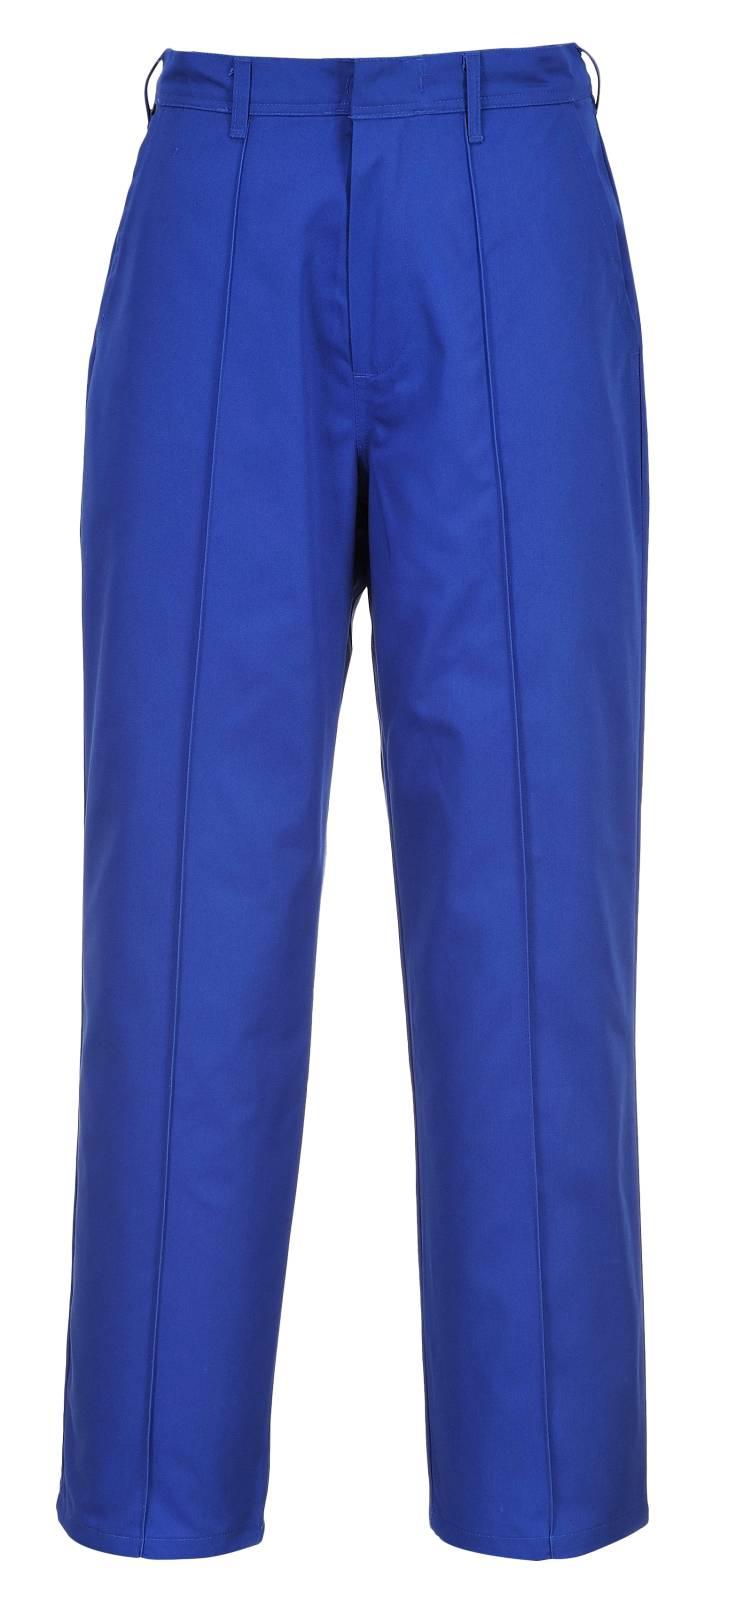 Portwest Werkbroeken 2085 UPF50+ UV koningsblauw(RB)